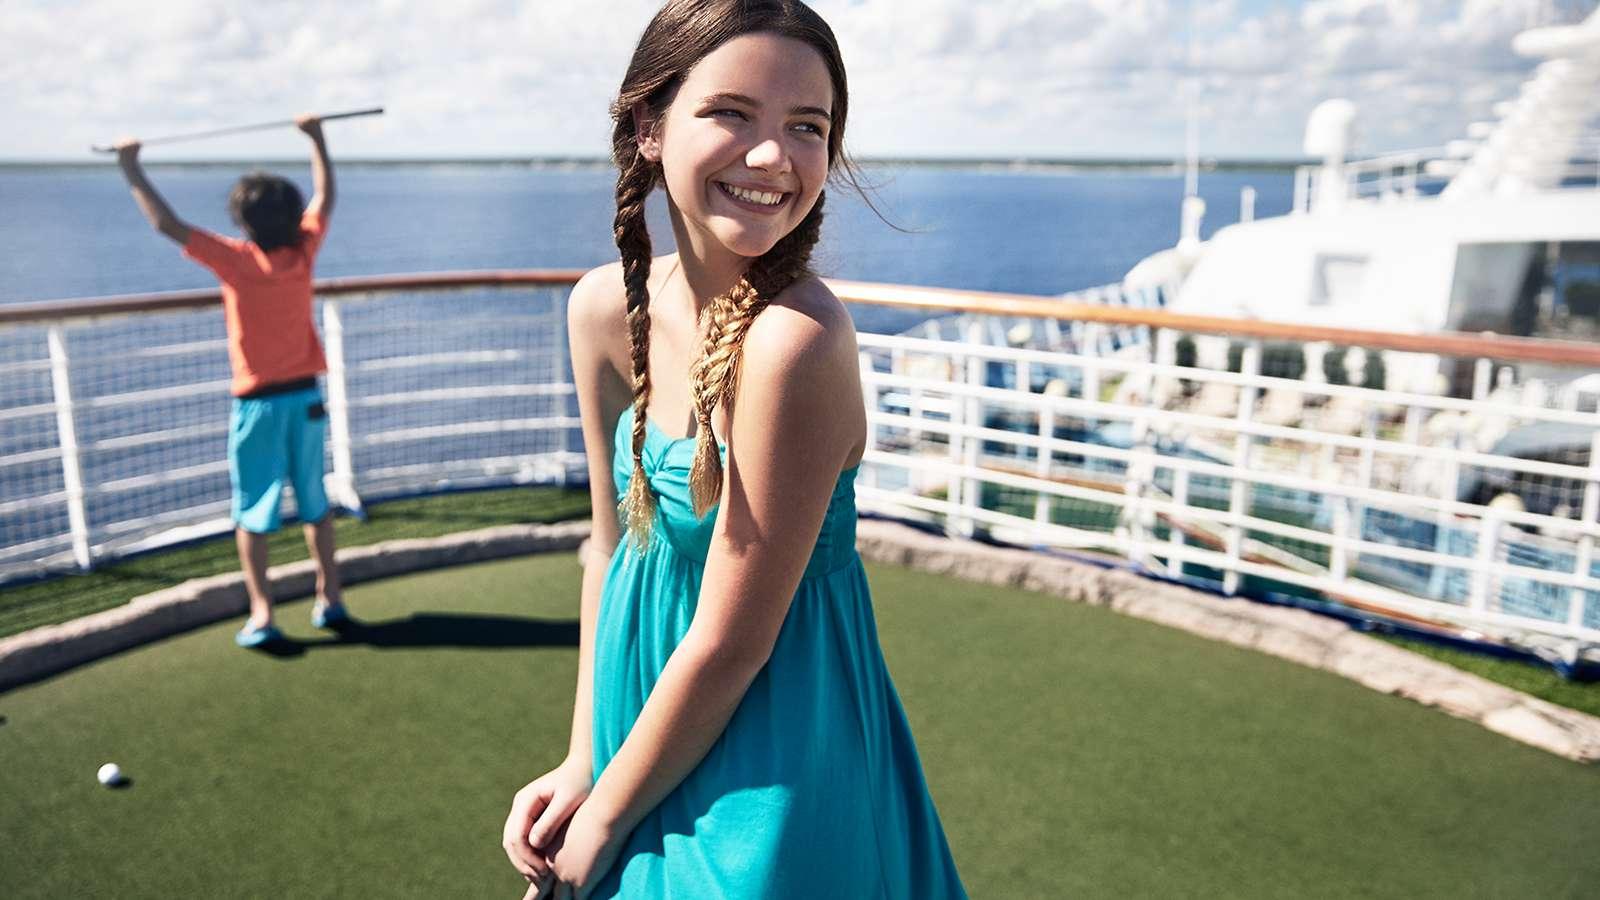 �������� Princess Cruises ��乫���� Emerald Princess �ݺᶫ�����к�11������������� 2019��7��12�ձ������� �ŵ�Ǵ� ���߱��:7719071211